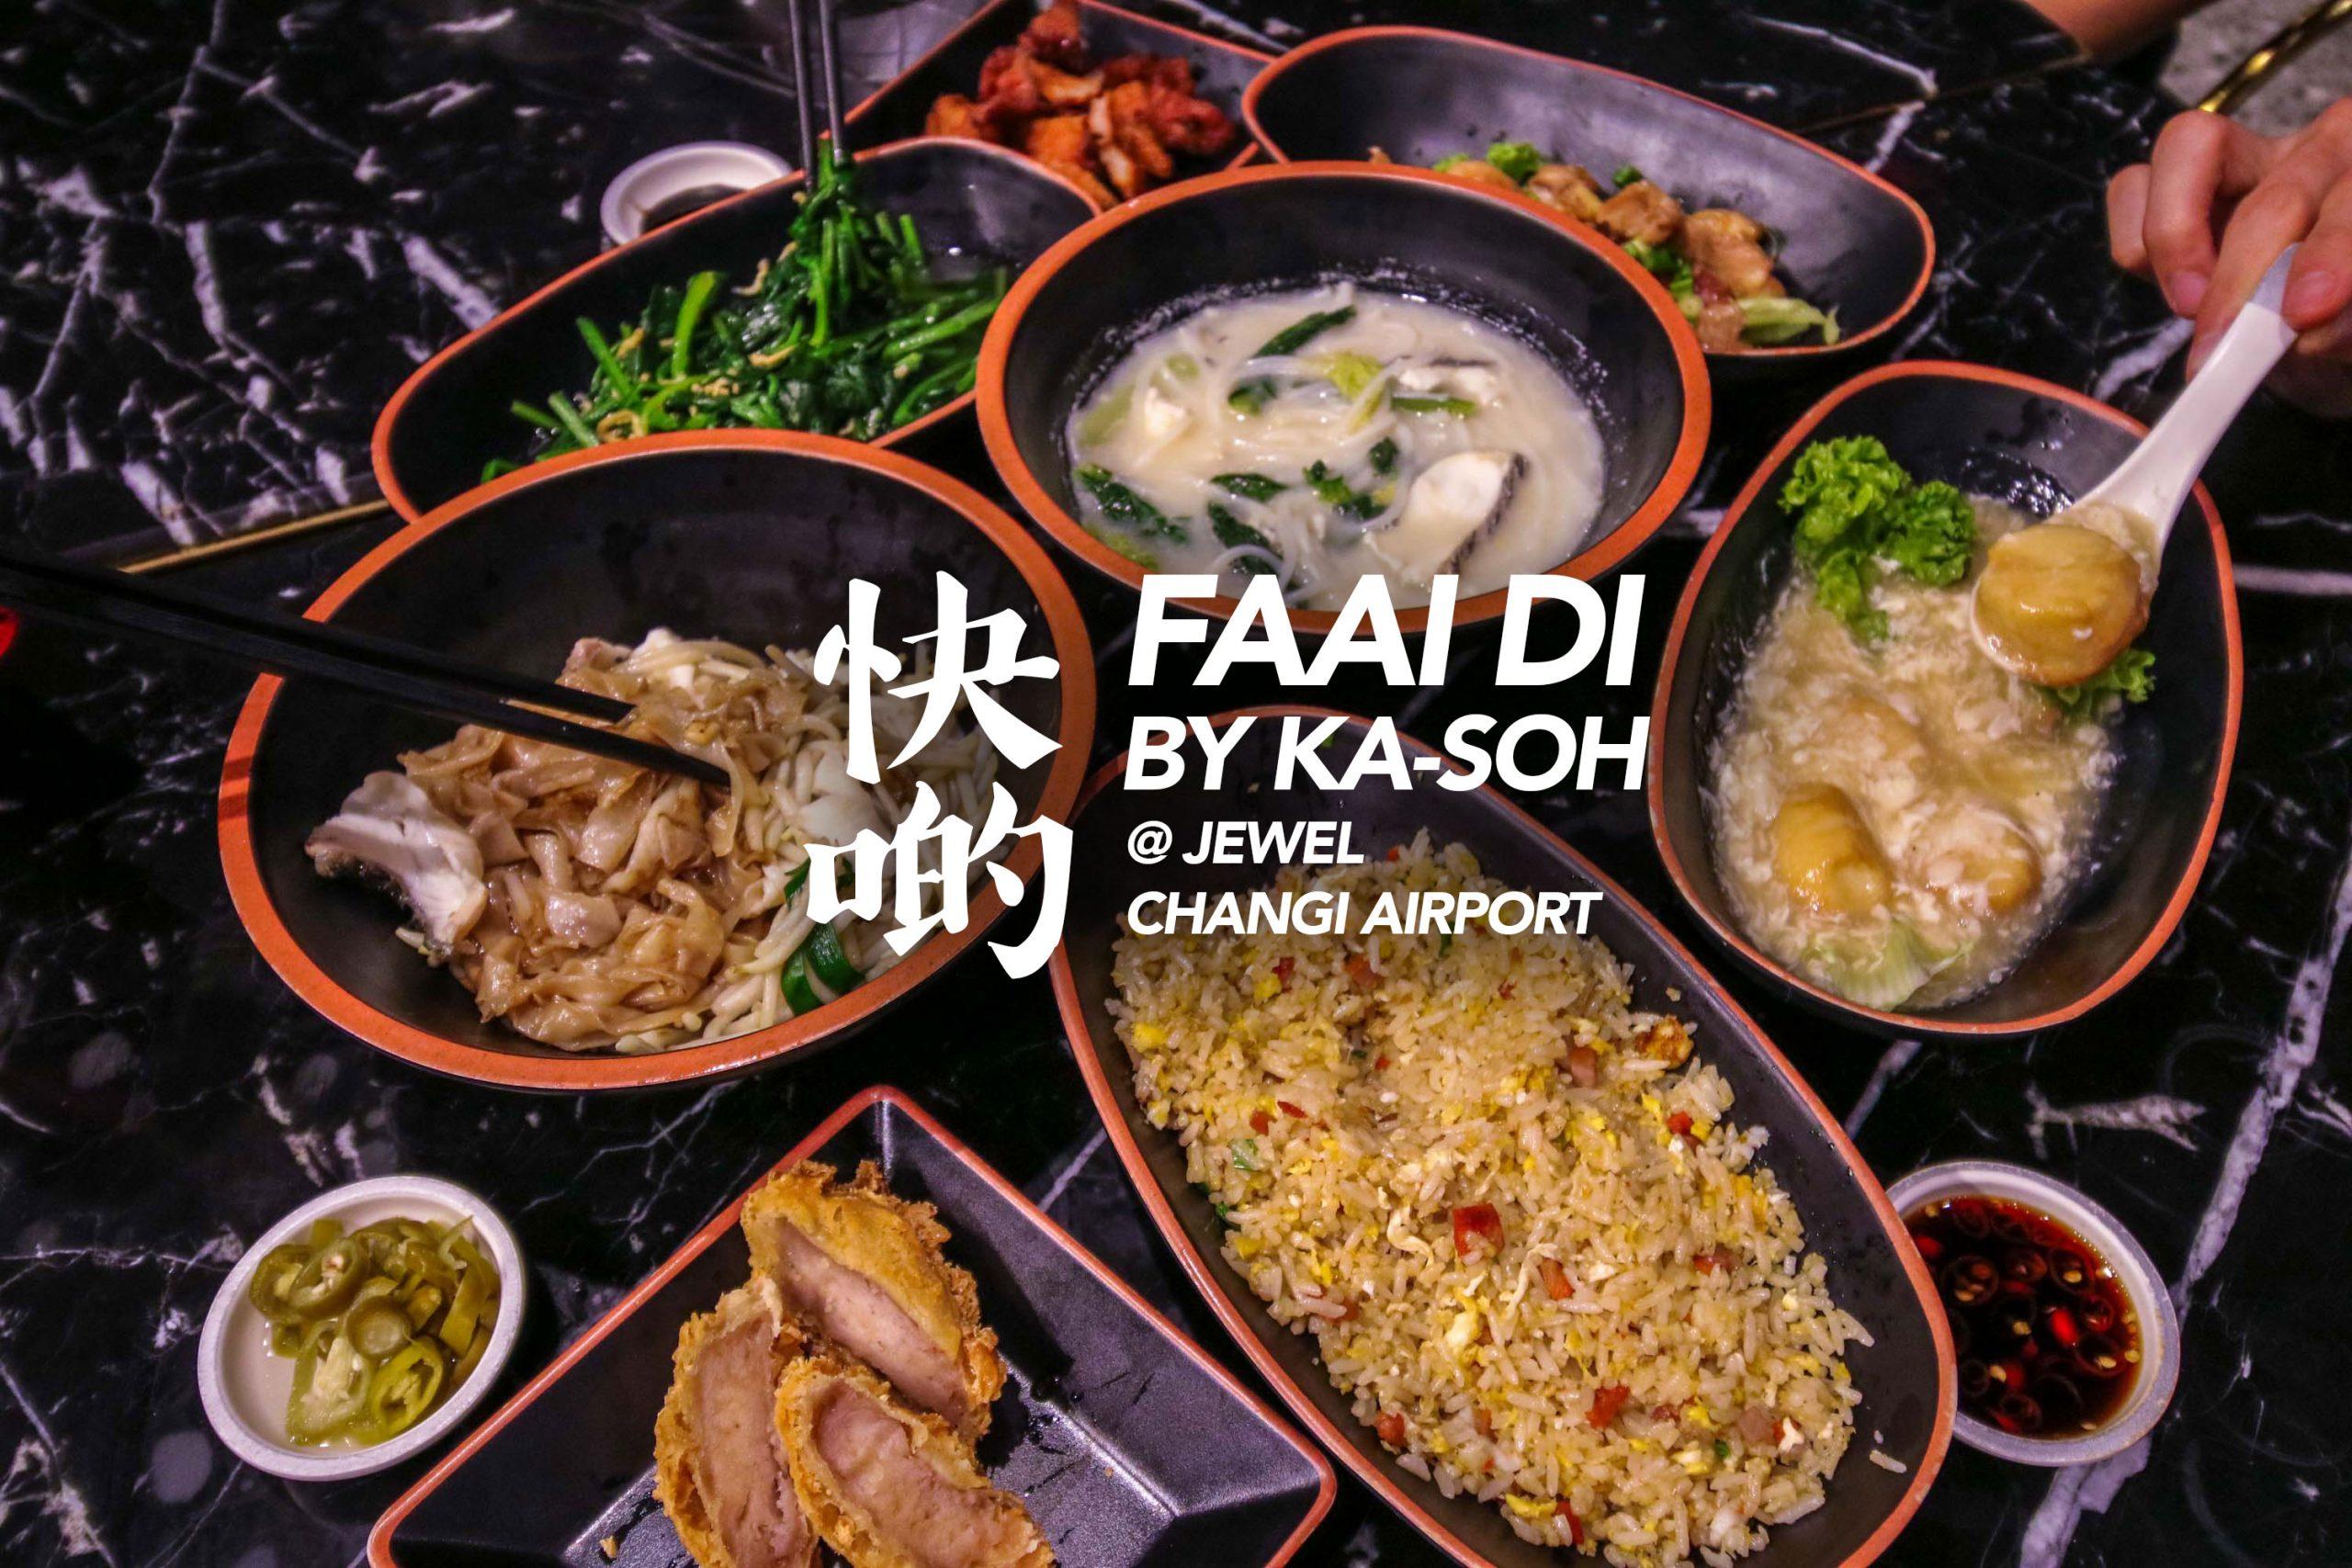 Faai-Di-Ka-Soh-Jewel-Changi-Airport-darrenbloggie